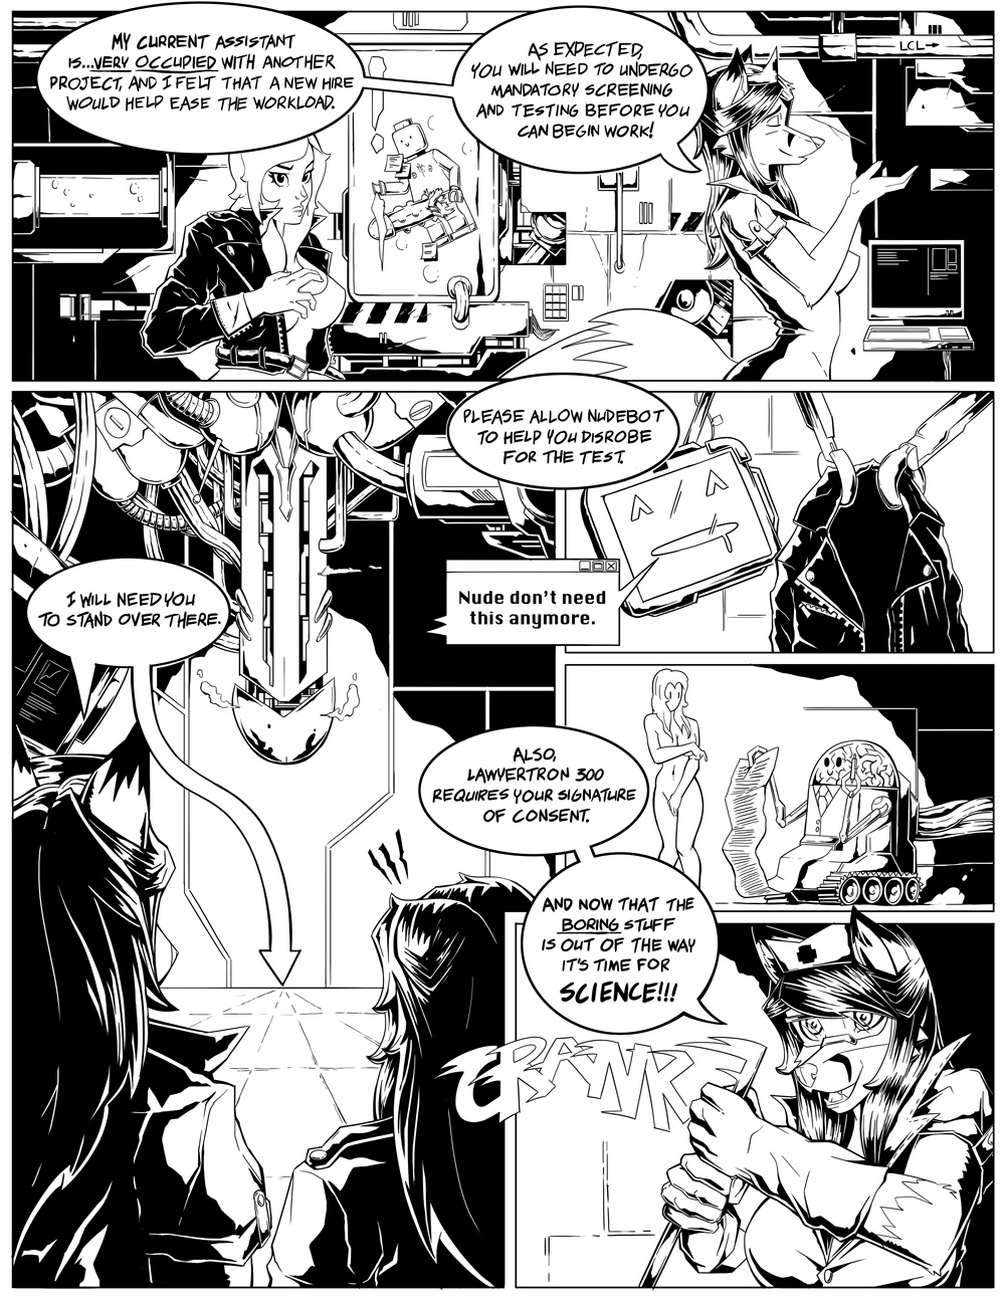 Slick-Science 3 free sex comic